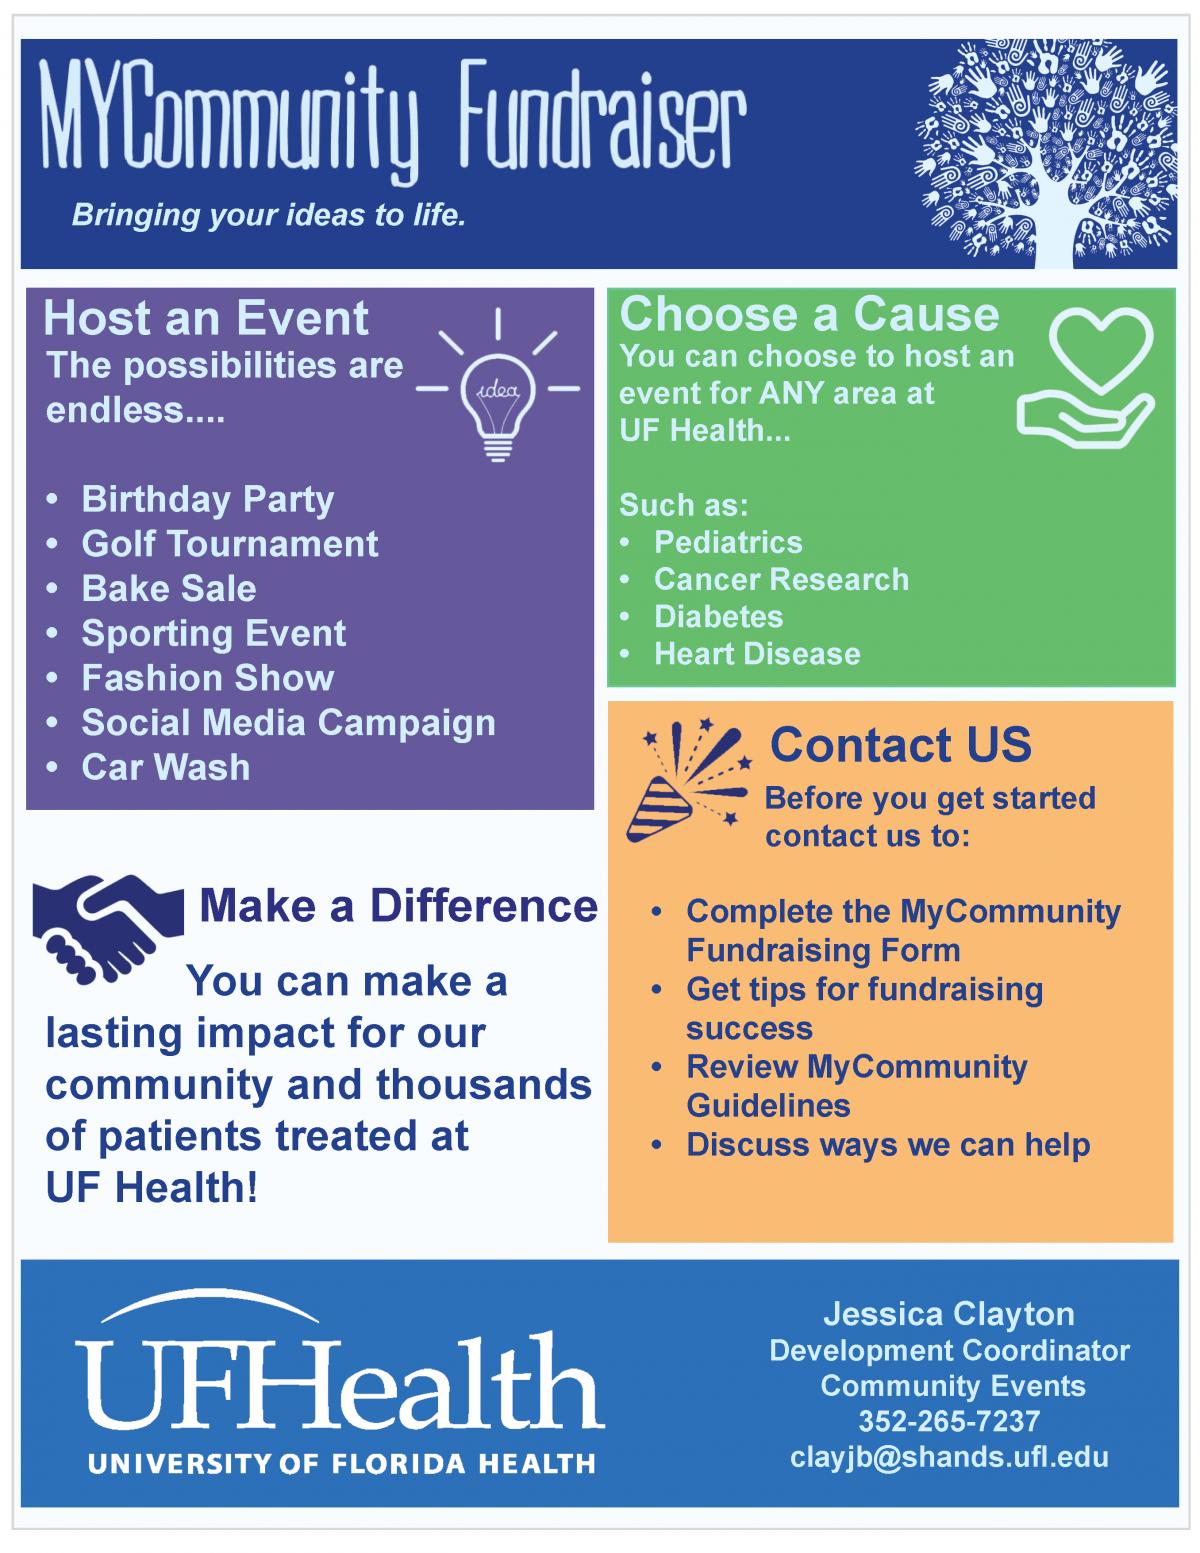 MyCommunity Fundraiser